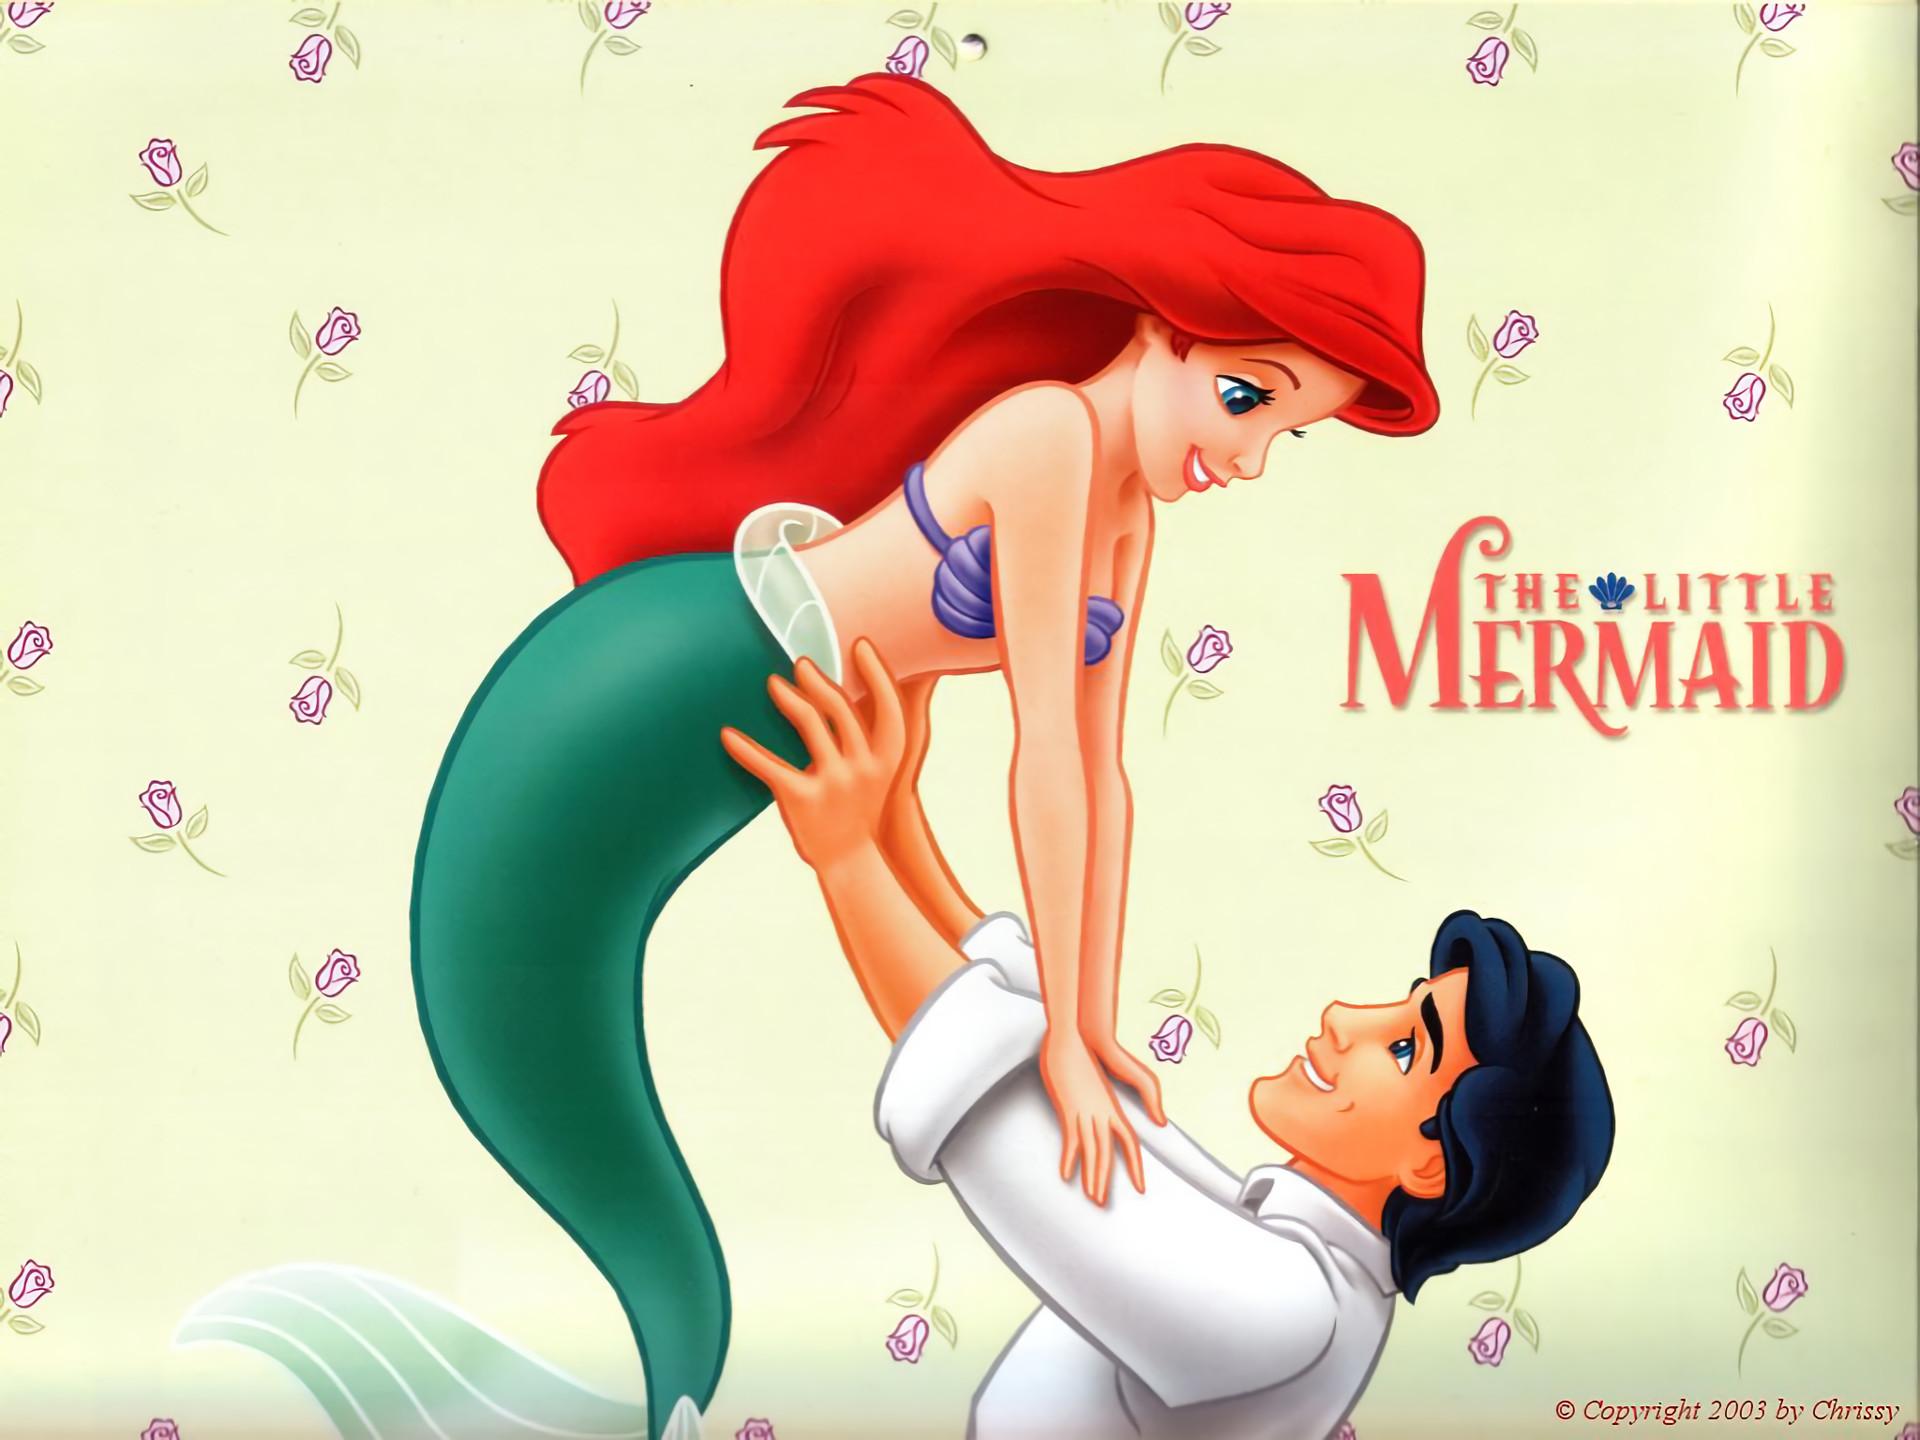 2560x1440 Disney The Little Mermaid Ariel Floral Princess Iphone